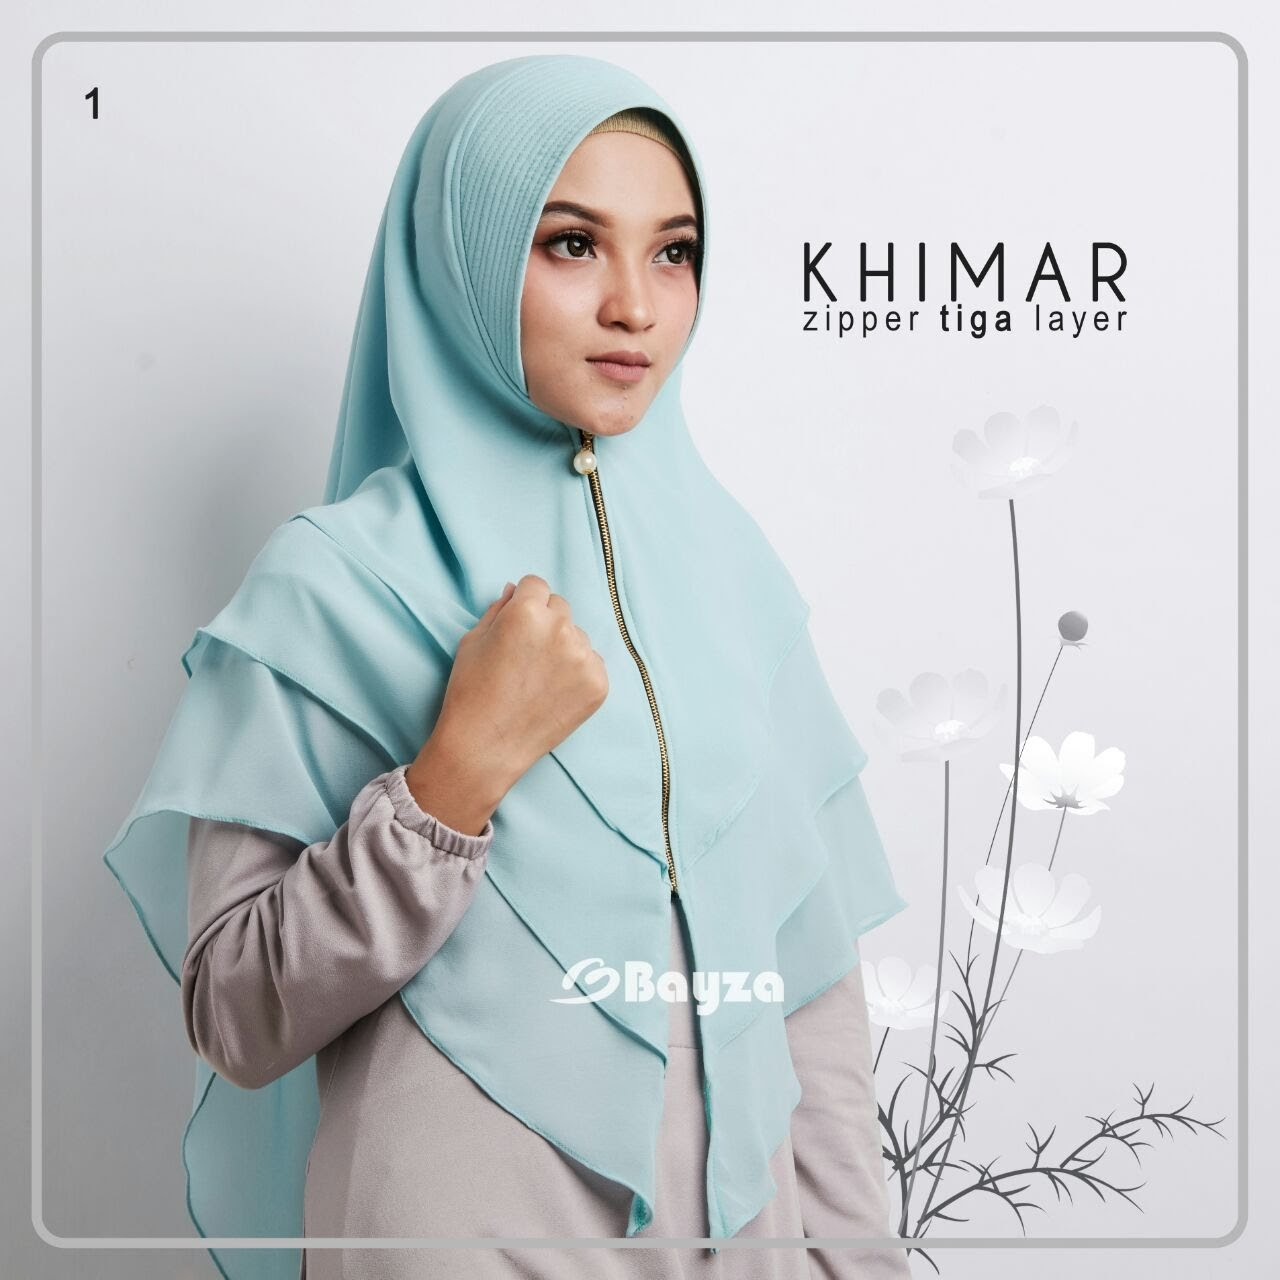 Khimar Zipper 3 Layer By Bayza Gerai Gamis Shafiyya Jilbab 3layer Syari Ori